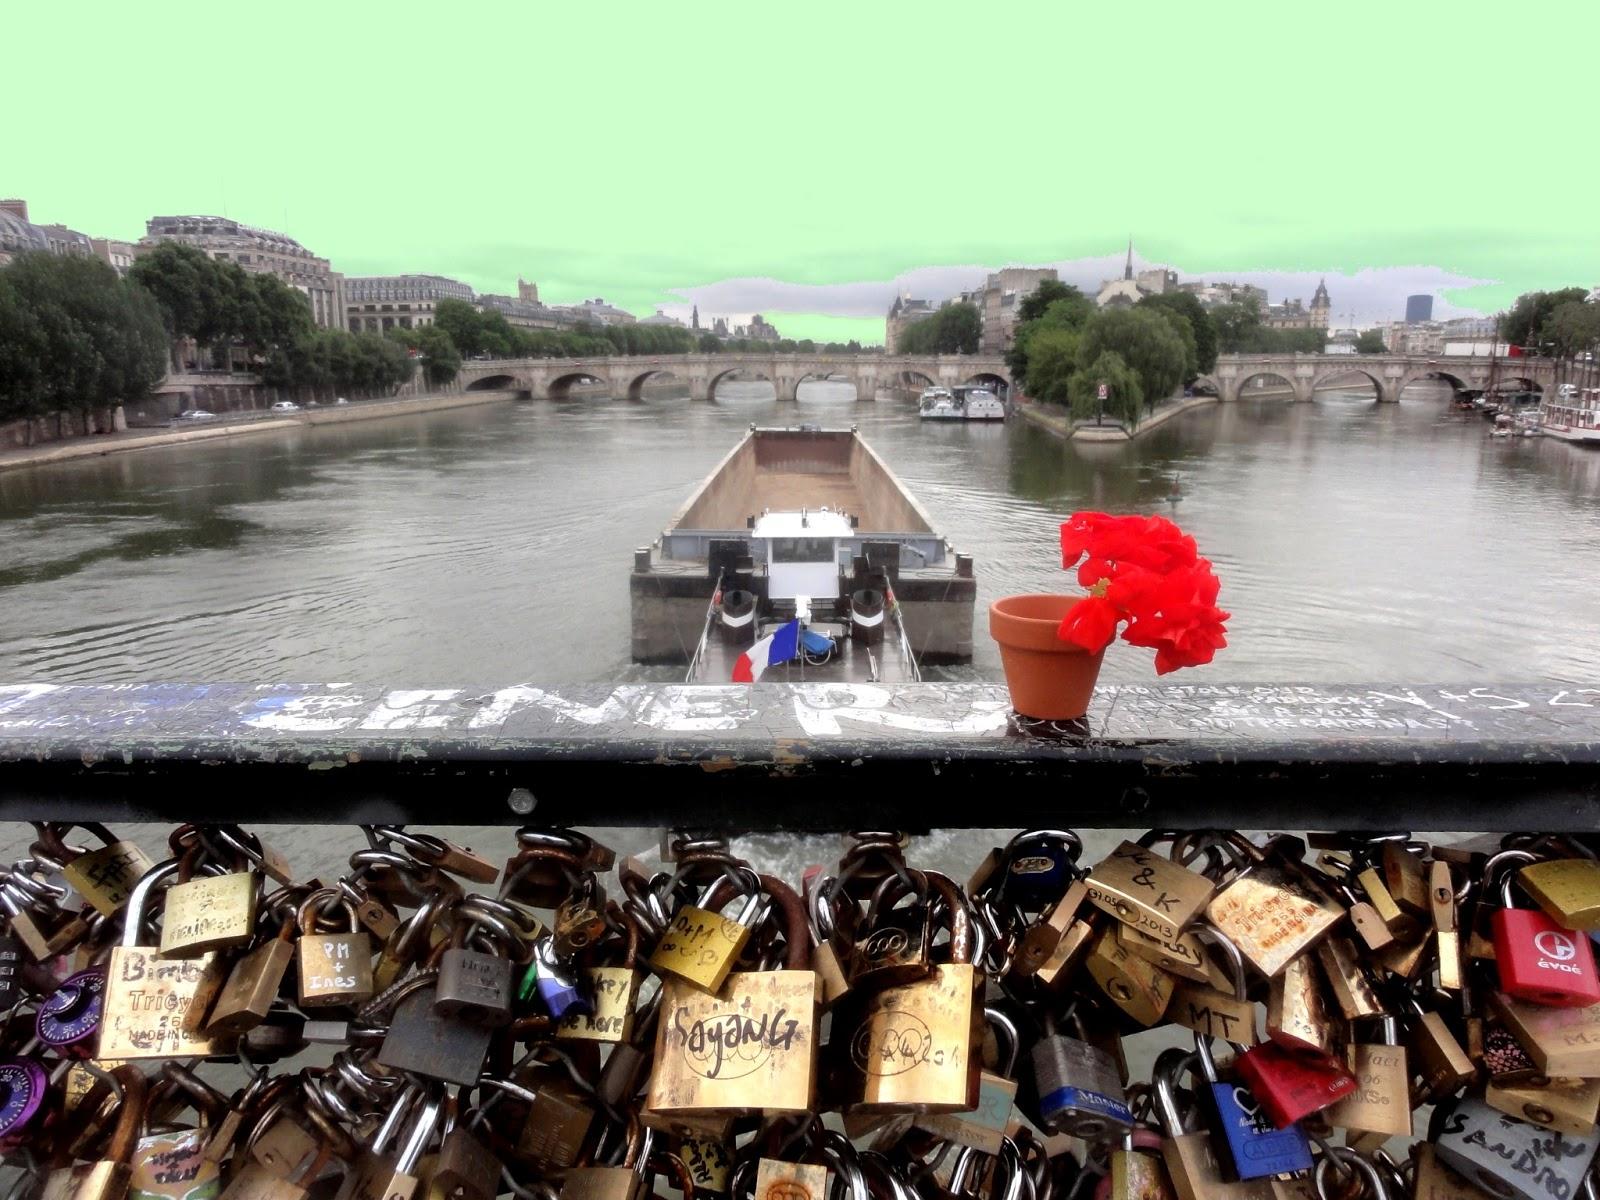 Bon Mardi  Pont+des+arts+barge+ardelle+pont+neuf+geranium+cadenas+bridge+of+love+padlock